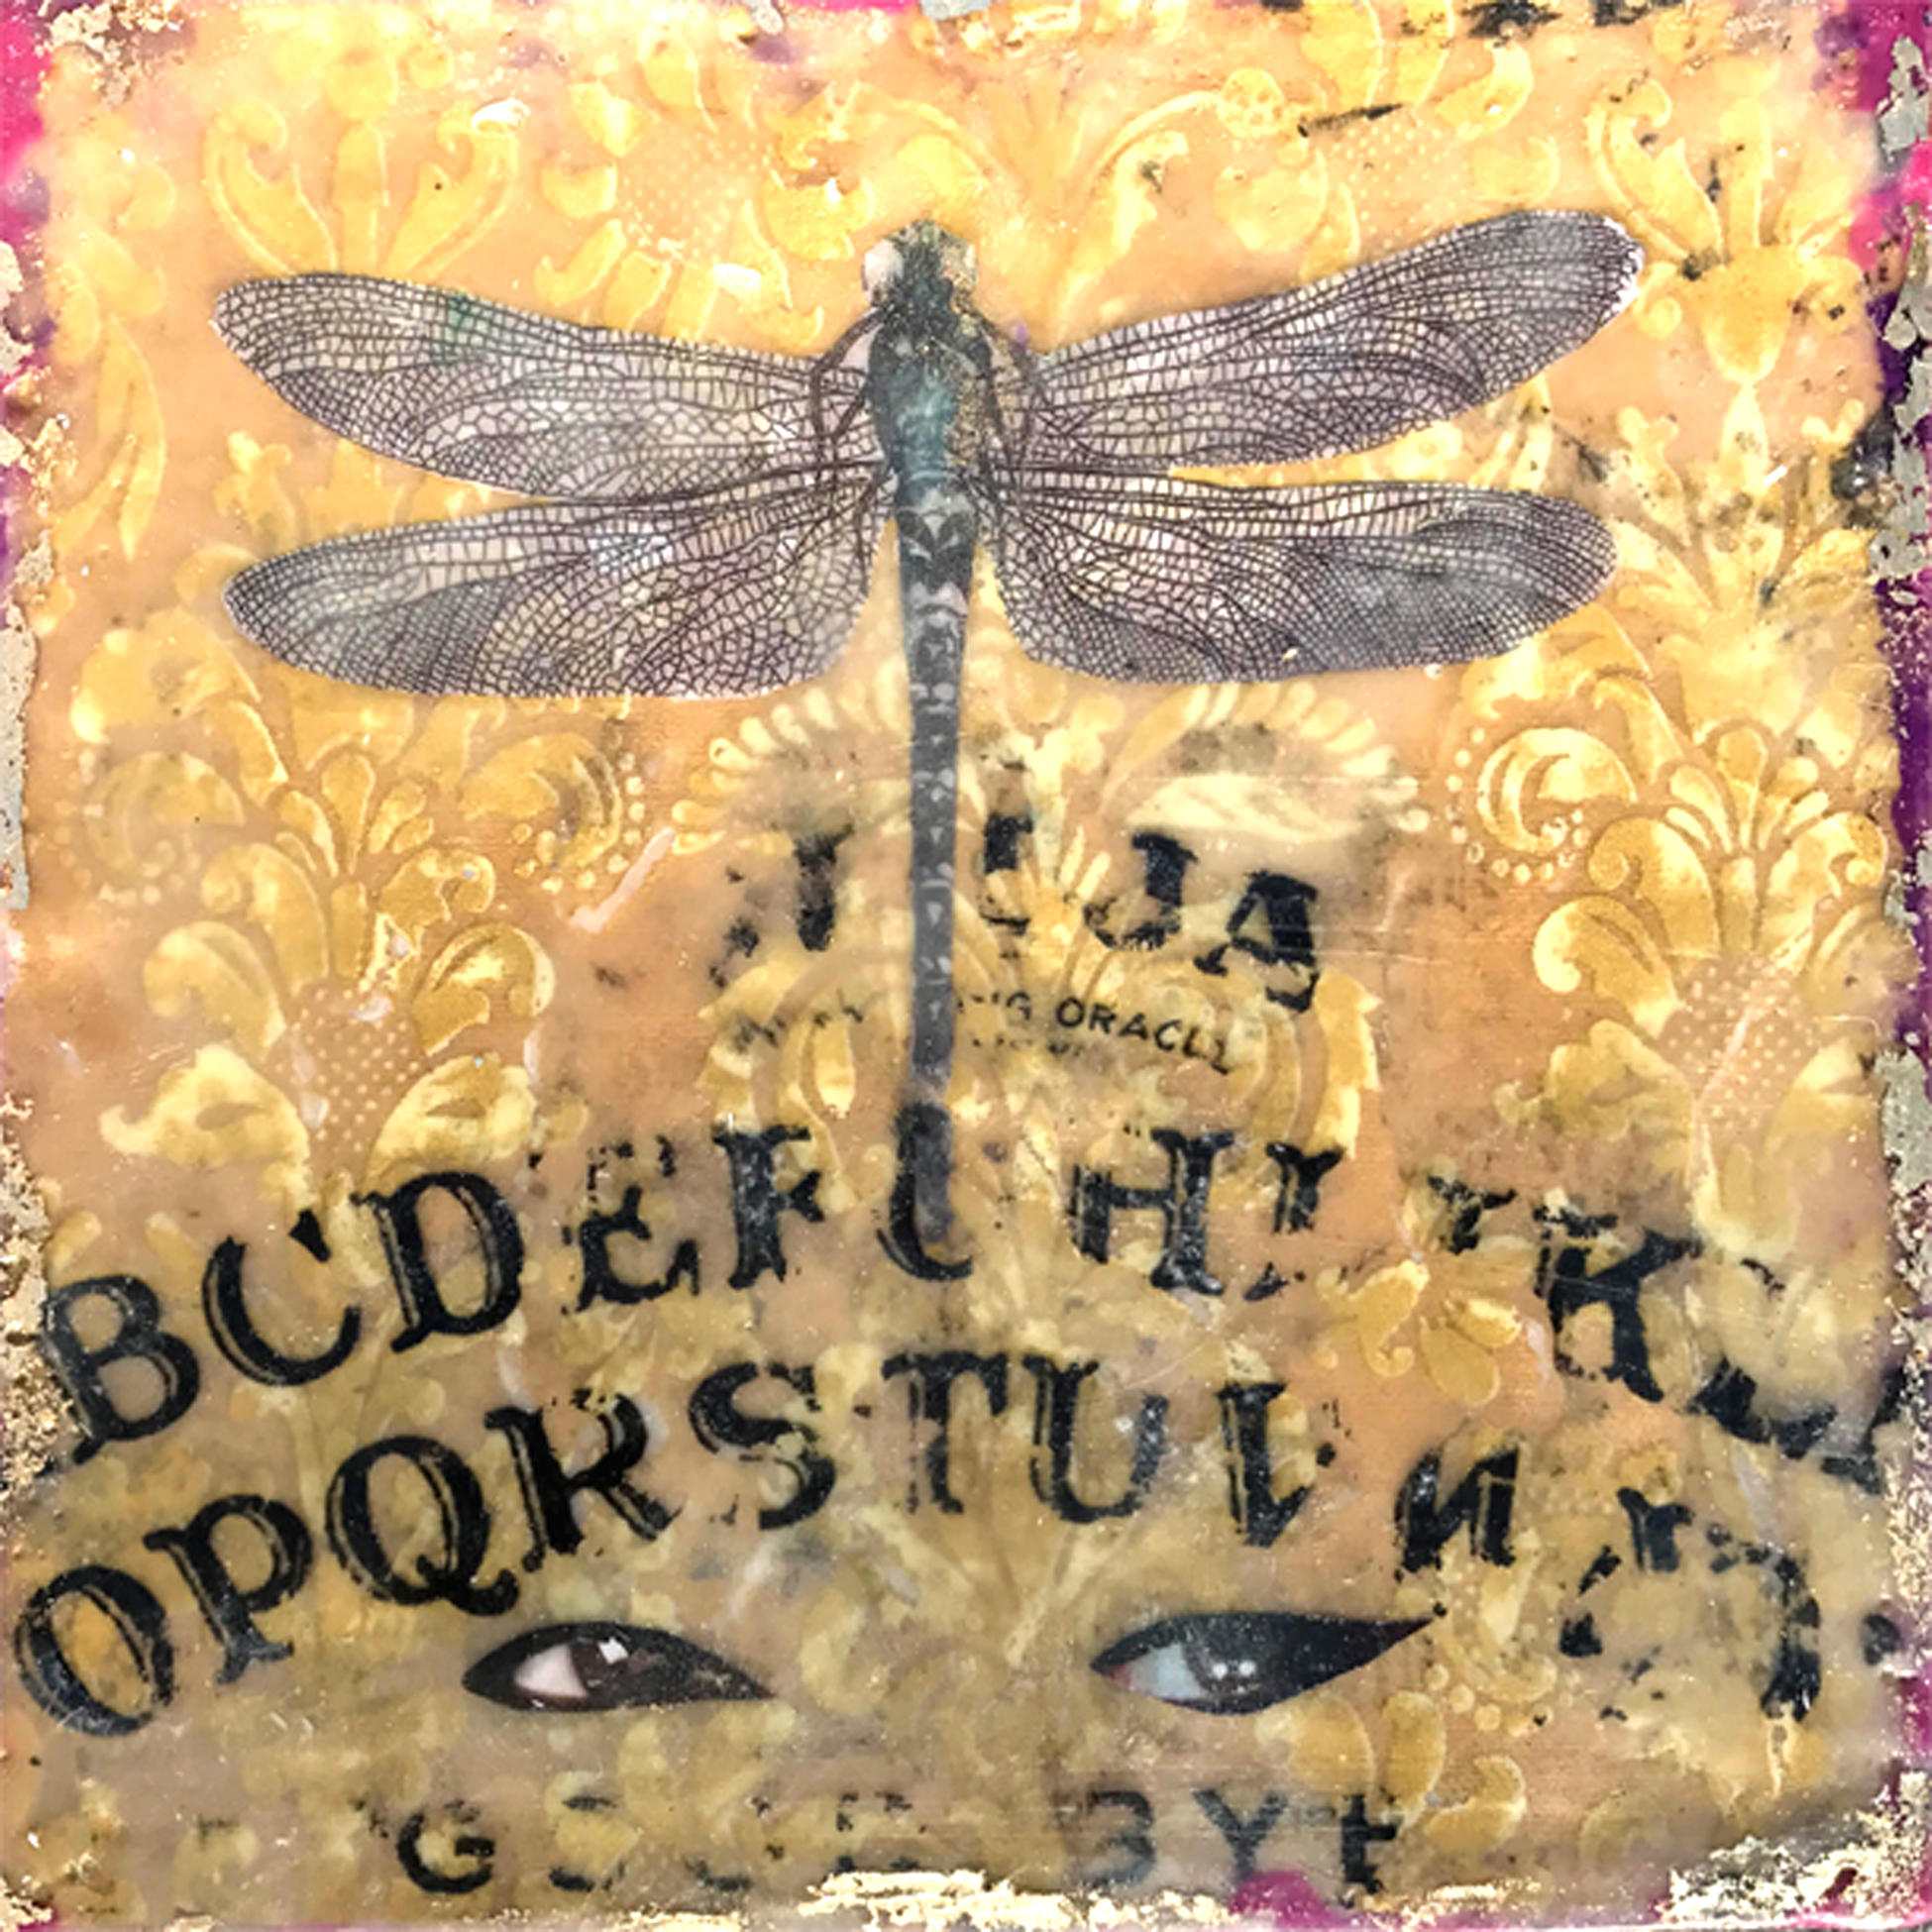 oija,dragonfly,eyes,surreal